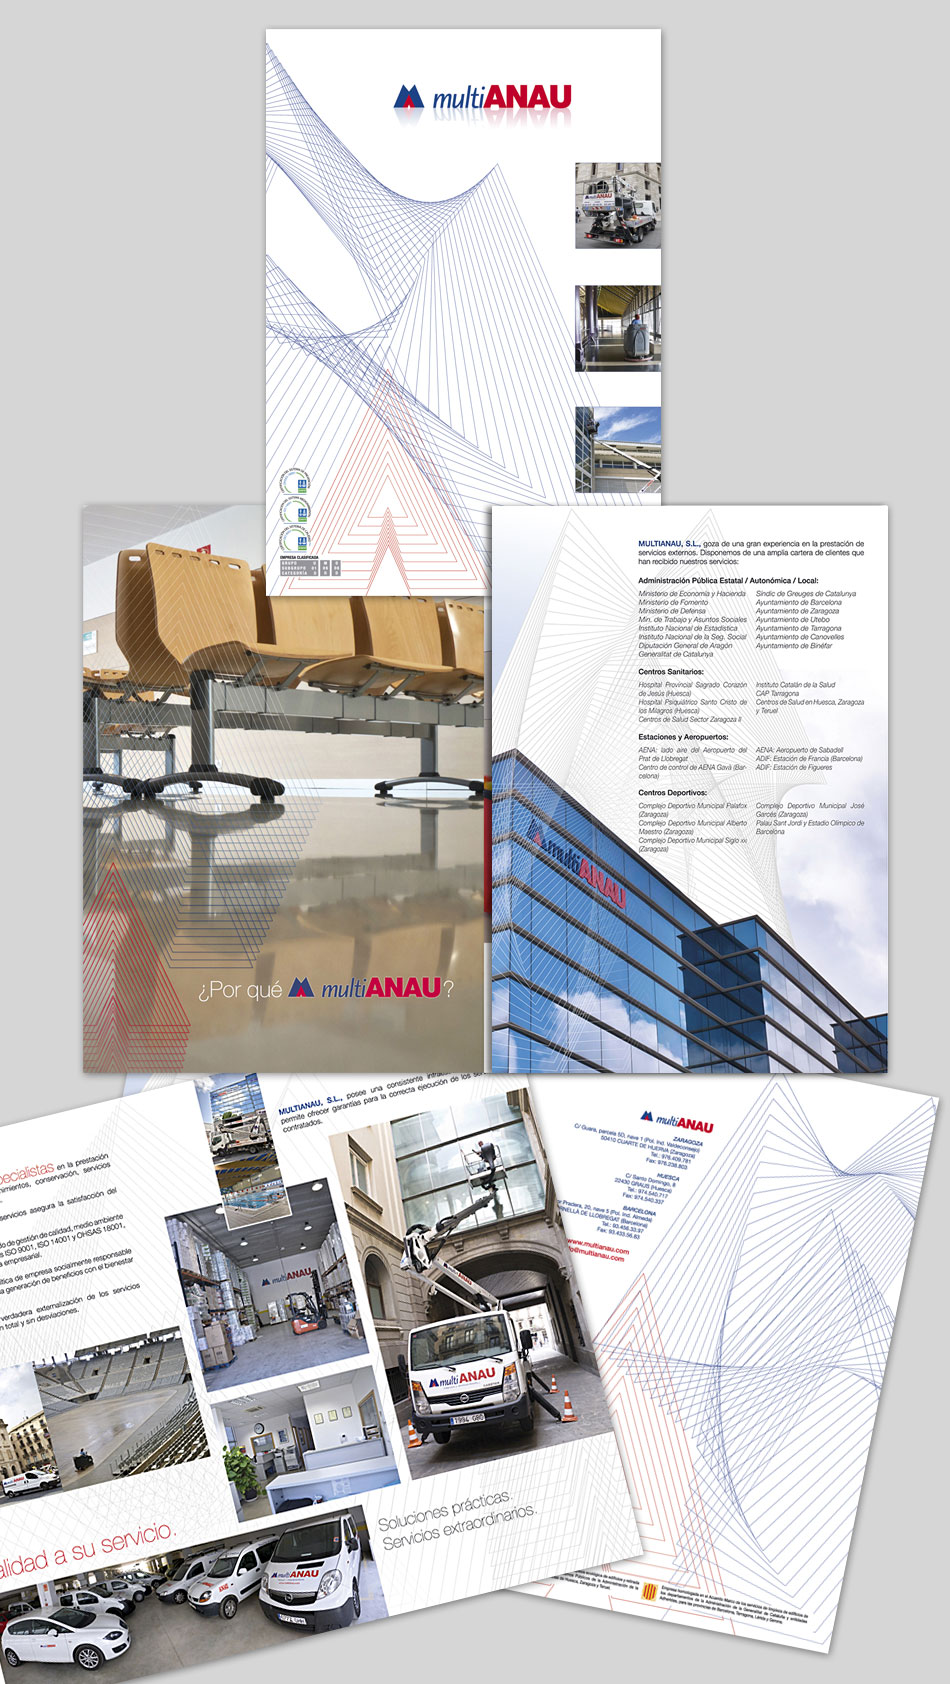 folleto-multianau